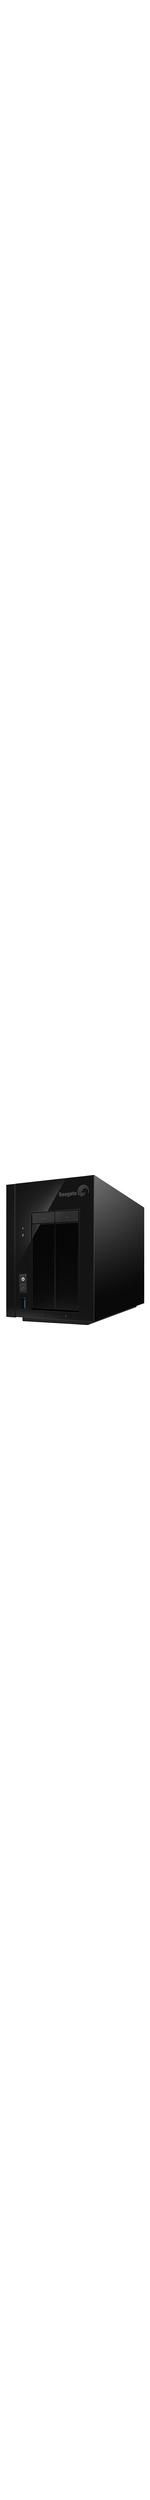 Seagate NAS Pro STDD8000200 2 x Total Bays NAS Server - Desktop